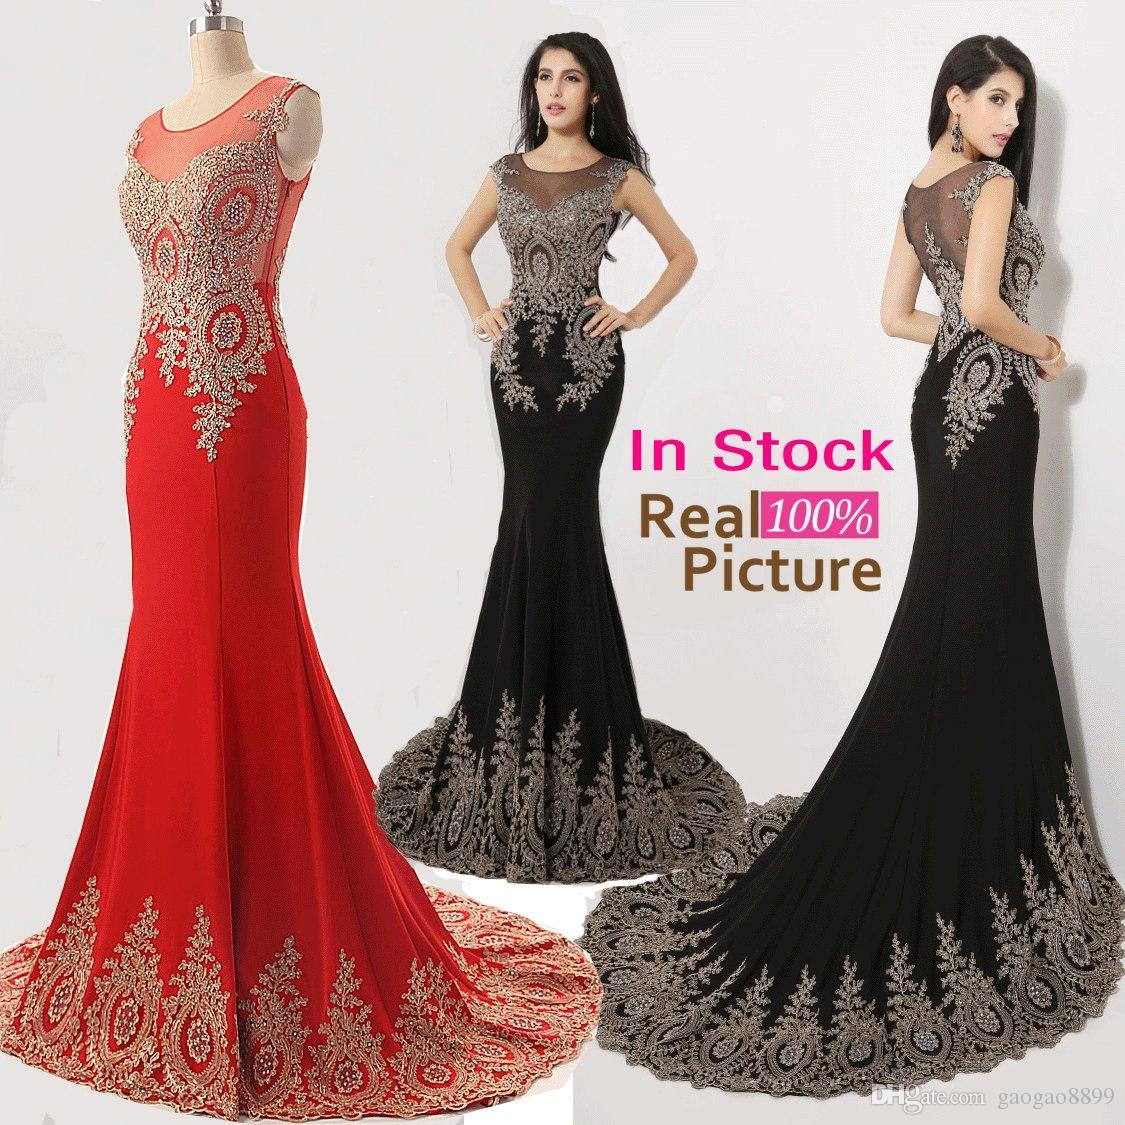 plus size indian wedding dresses photo - 1